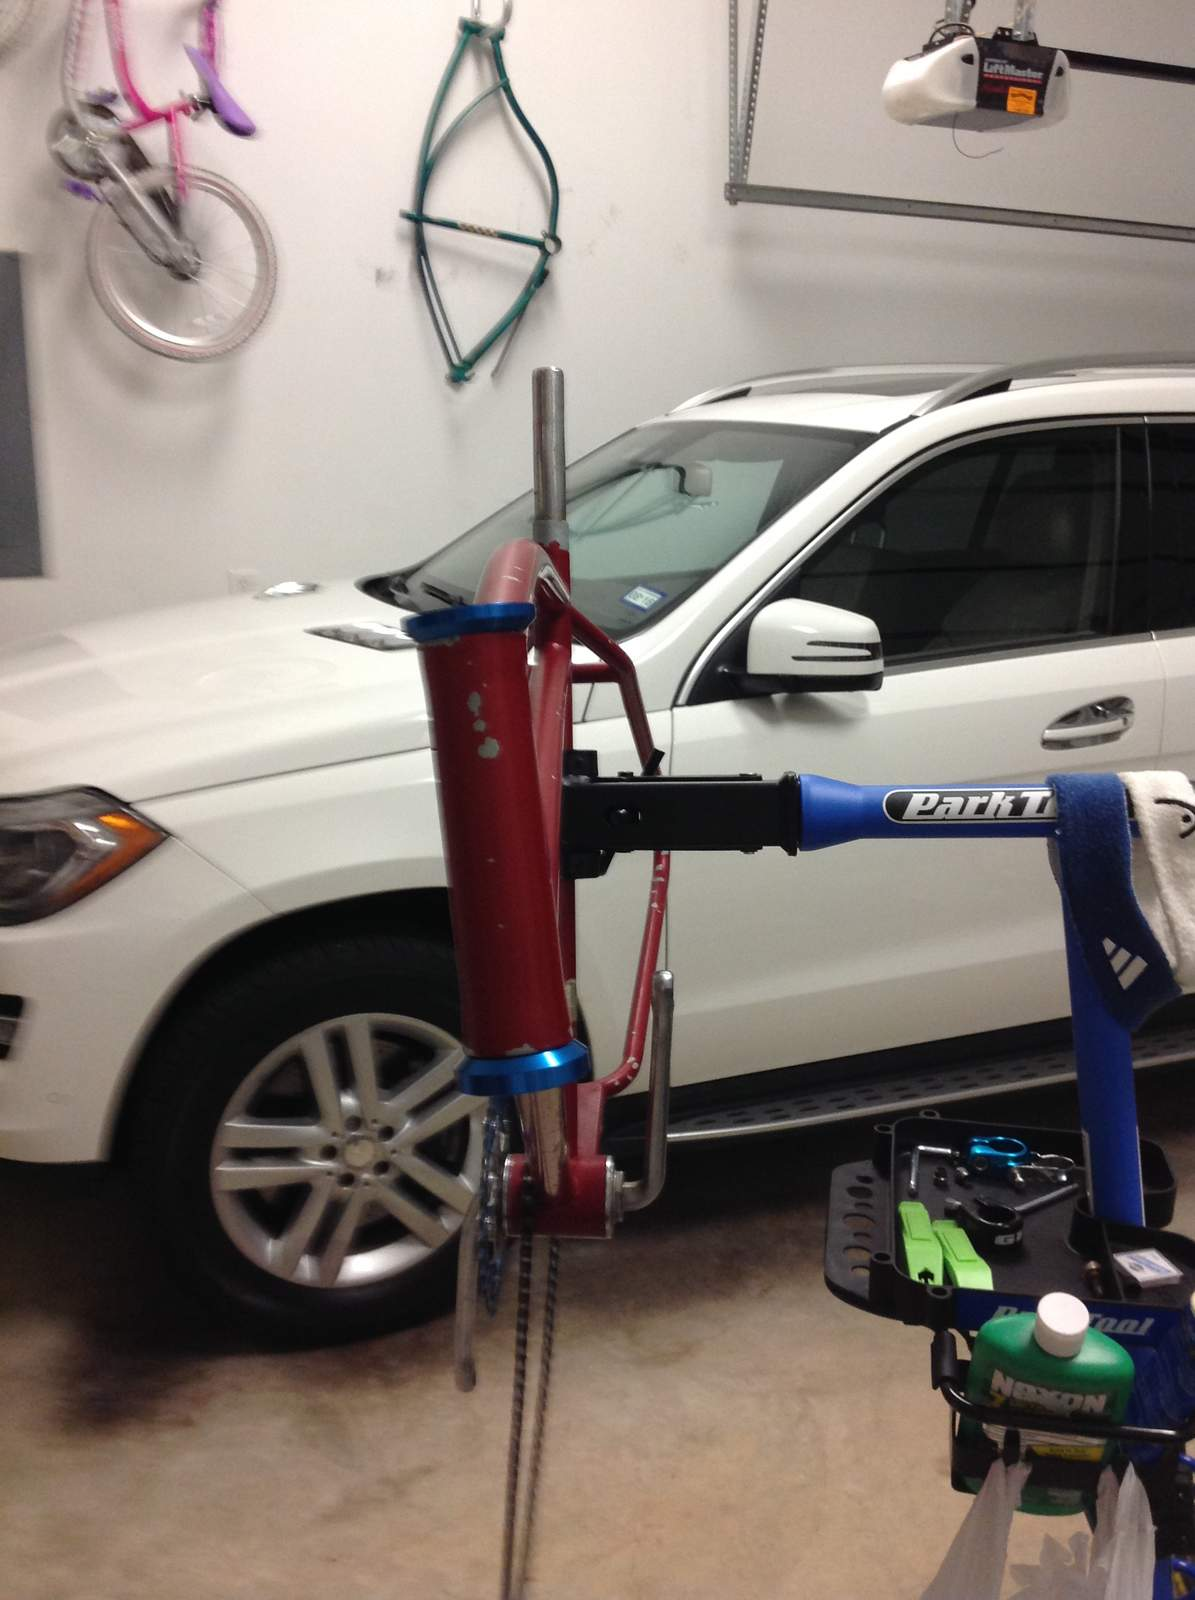 Built bike. Crashed bike. Bent frame. Help. - BMXmuseum.com Forums